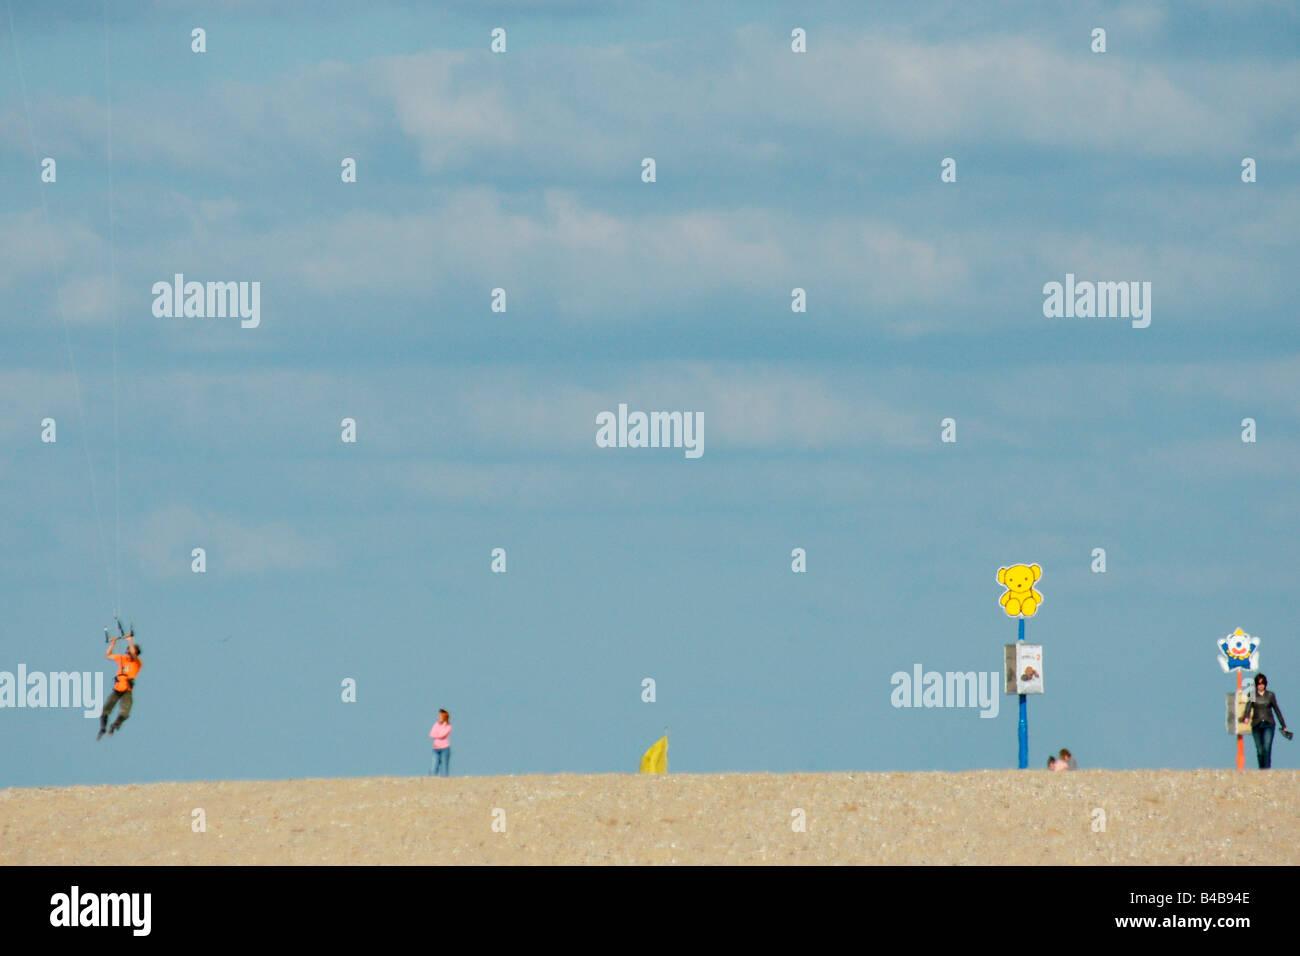 Woman walking sand beach with signs man flying powerkite in high wind at summer under blue sky Hoek van Holland - Stock Image